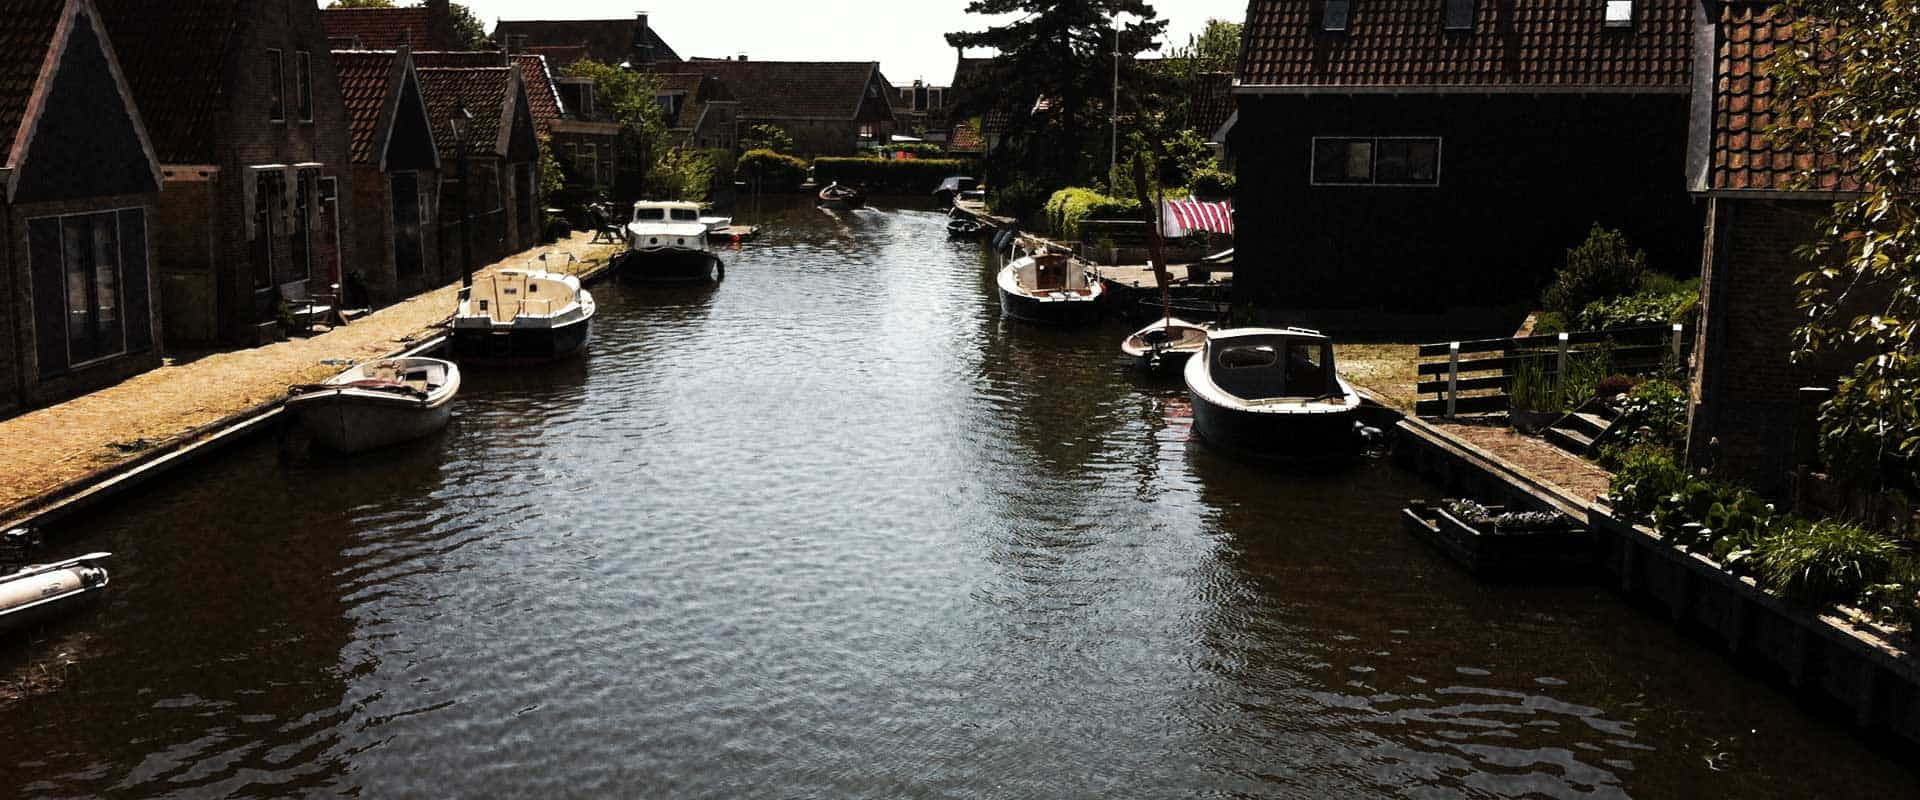 Zanderangeln am Kanal